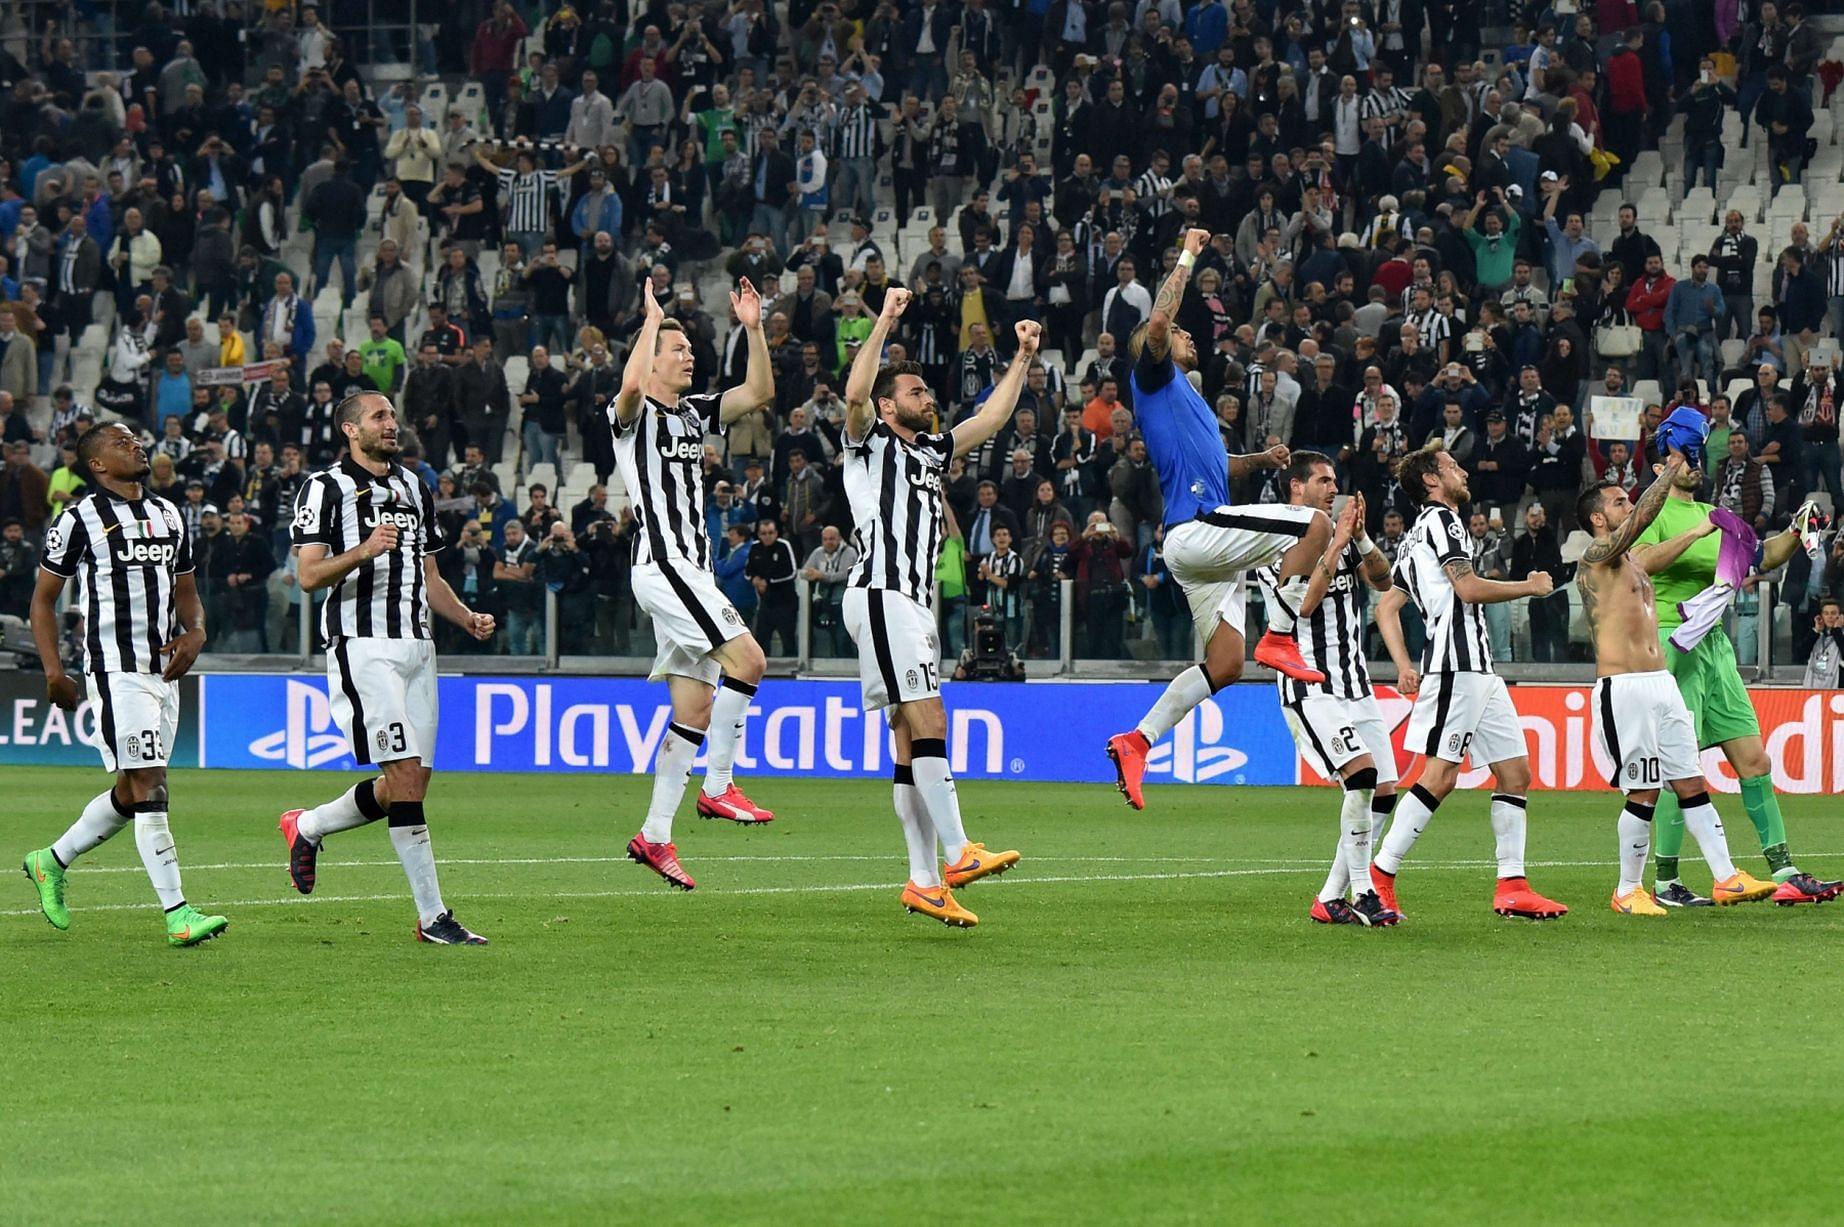 Juventus 1-0 AS Monaco - 5 talking points